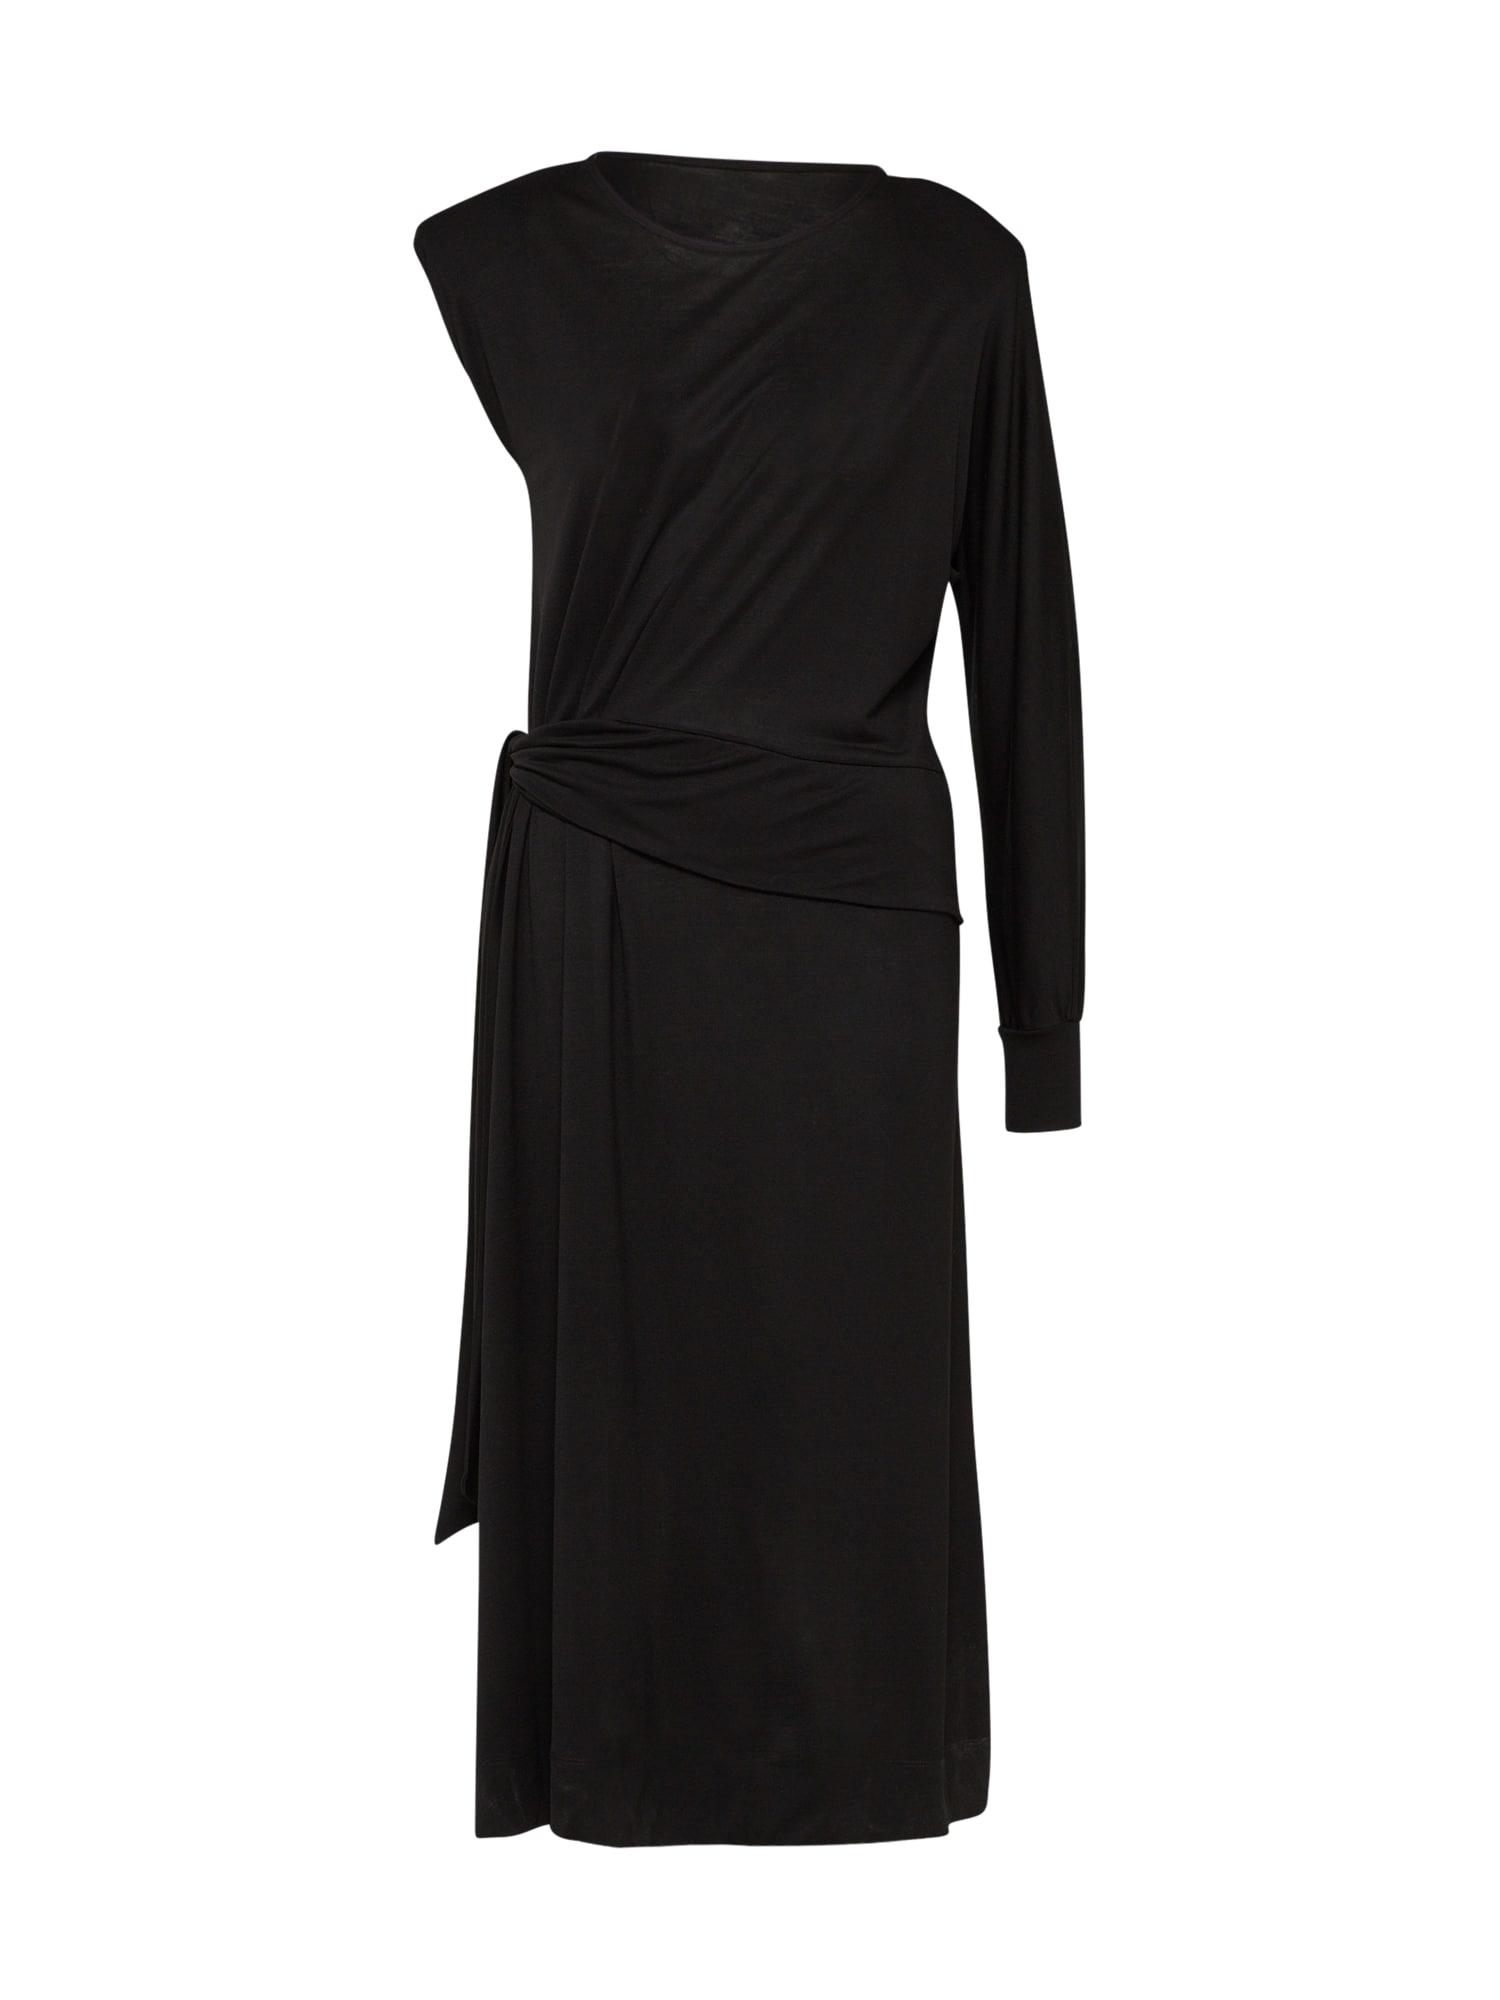 POSTYR Sukienka koktajlowa 'Posdaphne'  czarny